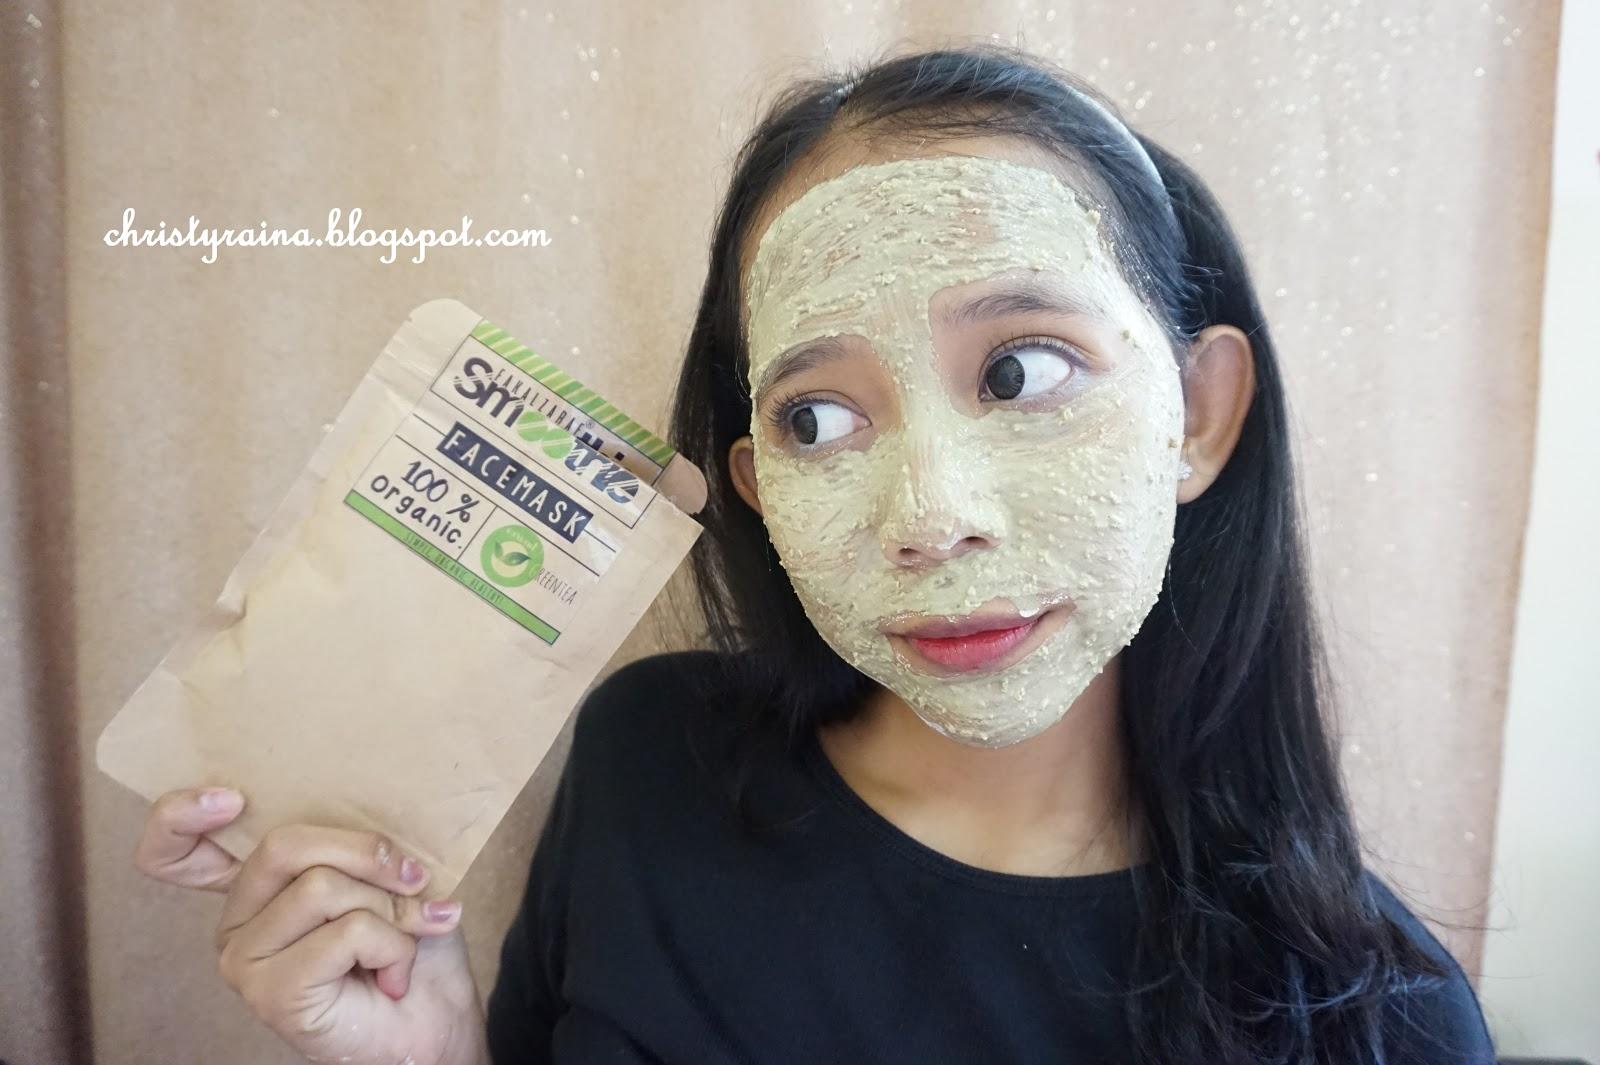 Masker Bubuk 100percent Organik Wajah Green Tea 150 Gr Tirus Bioaqua V Shaped Penirus 100 Mencerahkan Melembabkan Kulit 7271658 1111539690 Christyraina